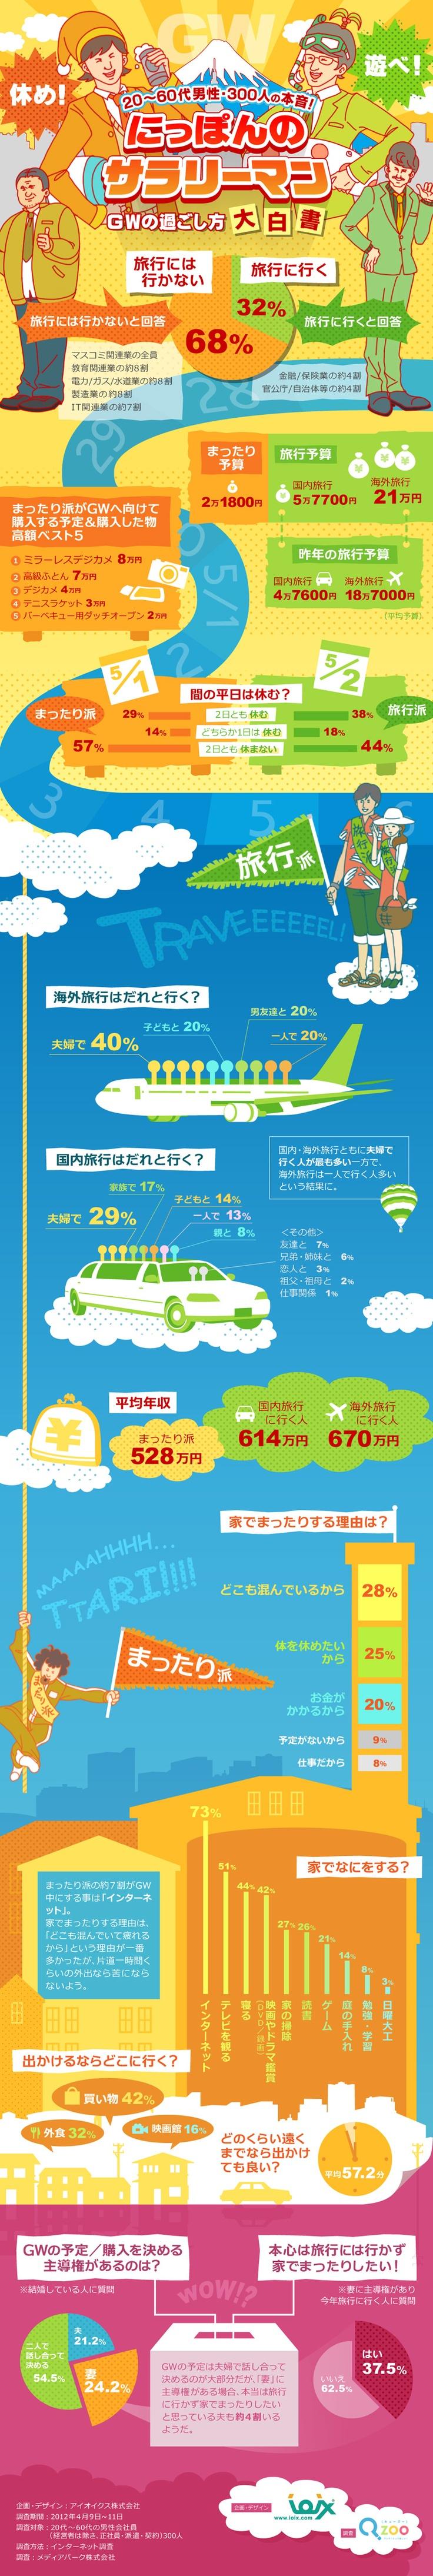 GWは休む?遊ぶ?不況を生きるサラリーマンの本音をまとめたインフォグラフィック | infographic.jp - インフォグラフィックス by IOIX